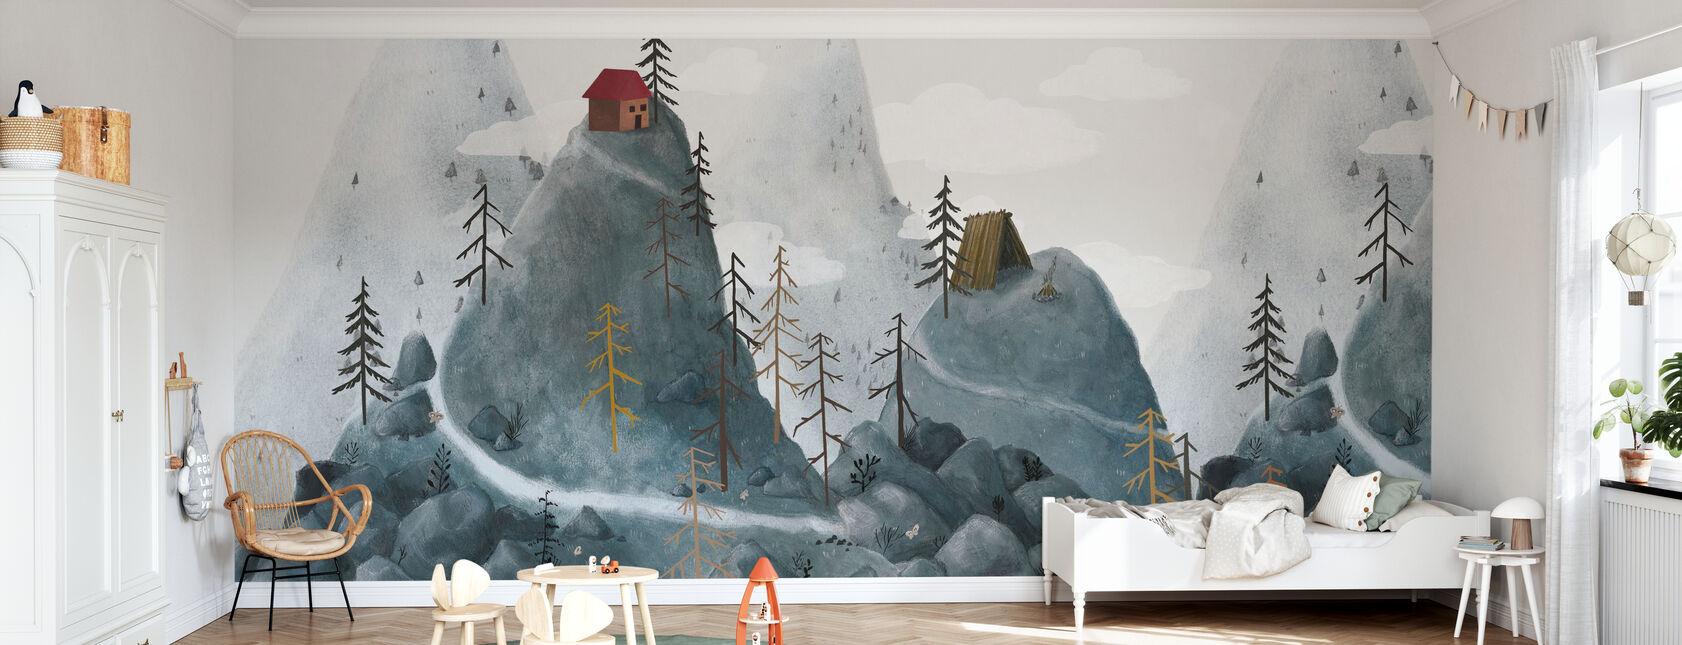 Village Fantasy Mountains - Wallpaper - Kids Room